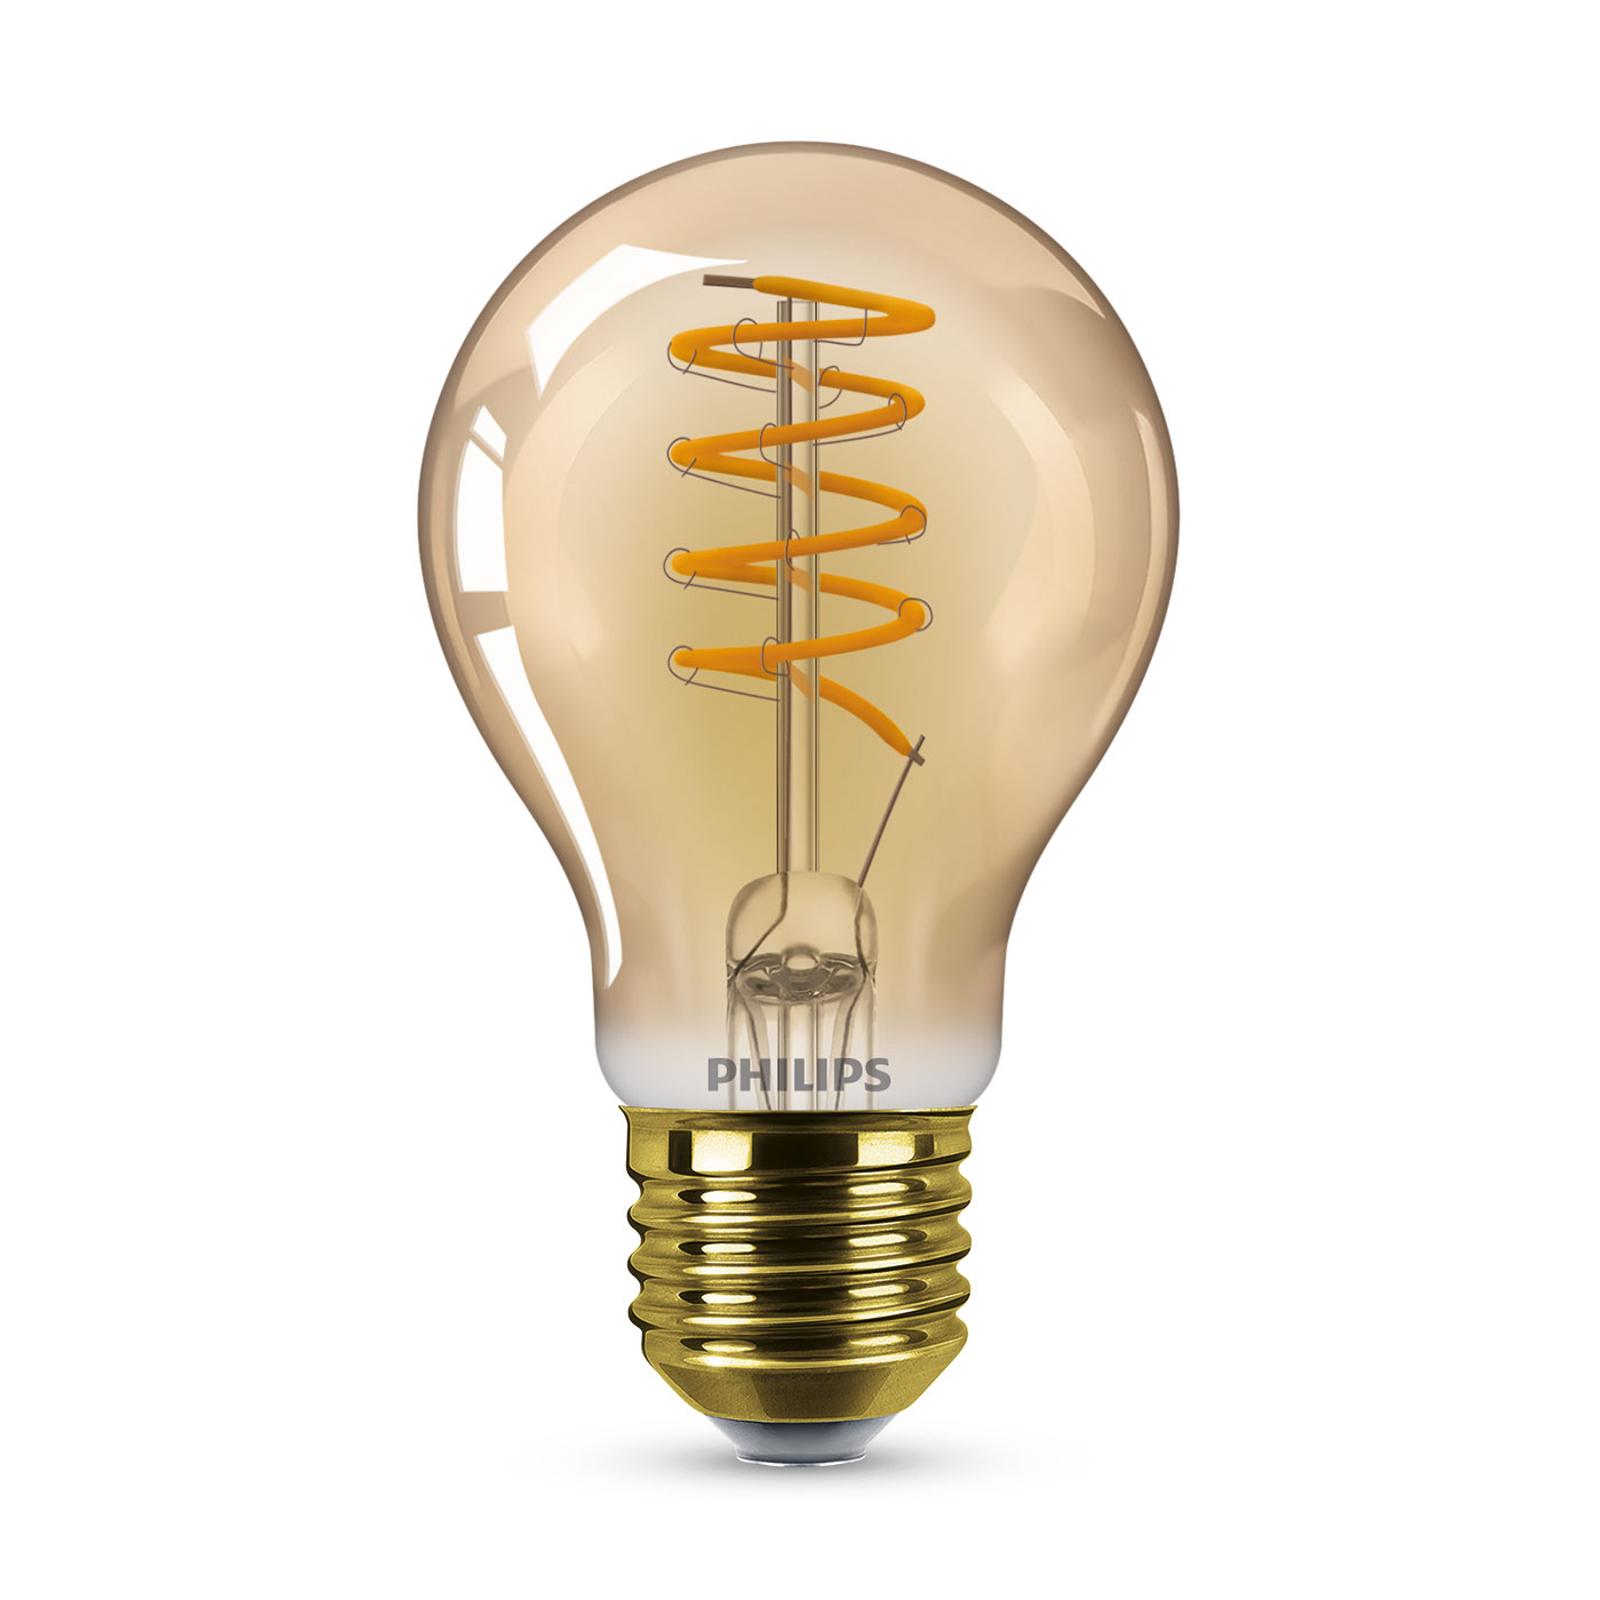 Philips LED-Lampe E27 A60 5,5W 1.800K gold dimmbar